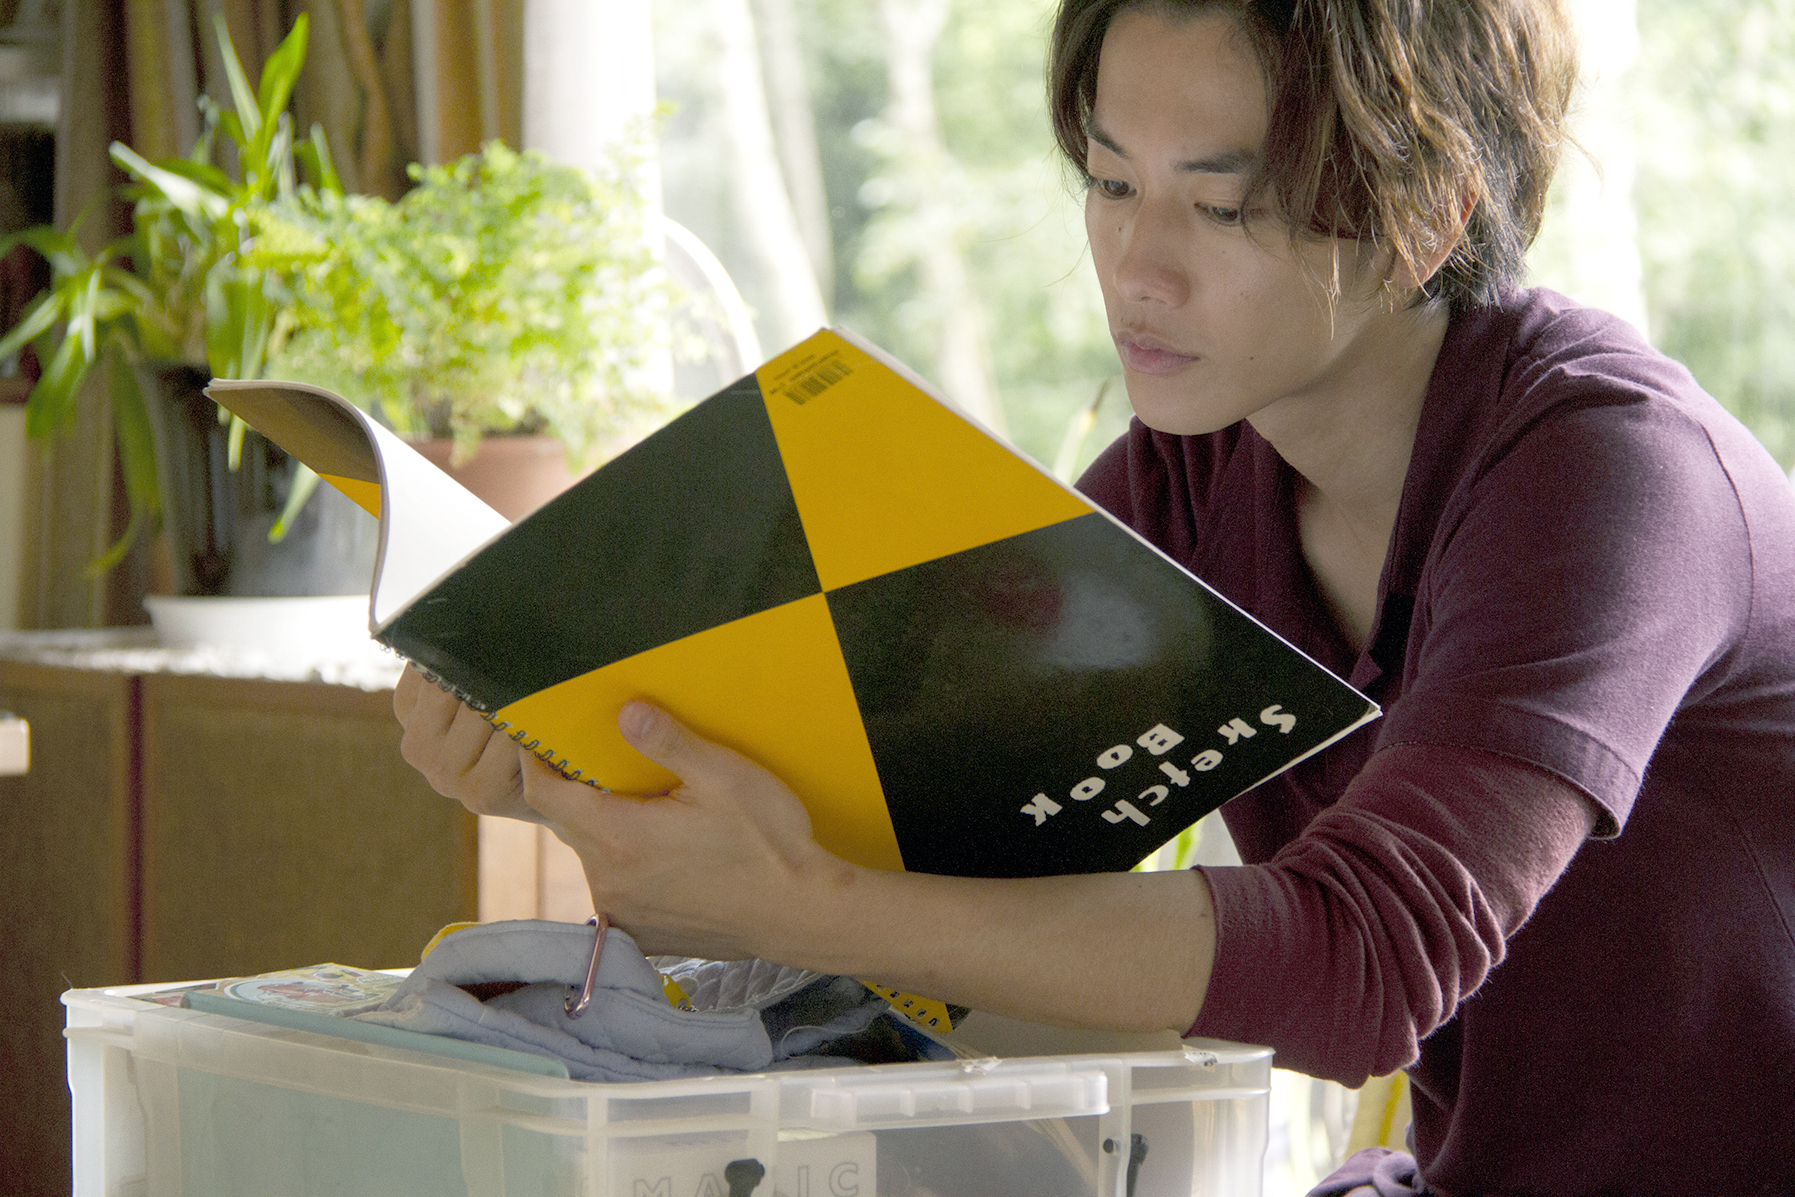 Haruka Ayase et Takeru Sato dans Real de Kiyoshi Kurosawa © Condor Entertainment